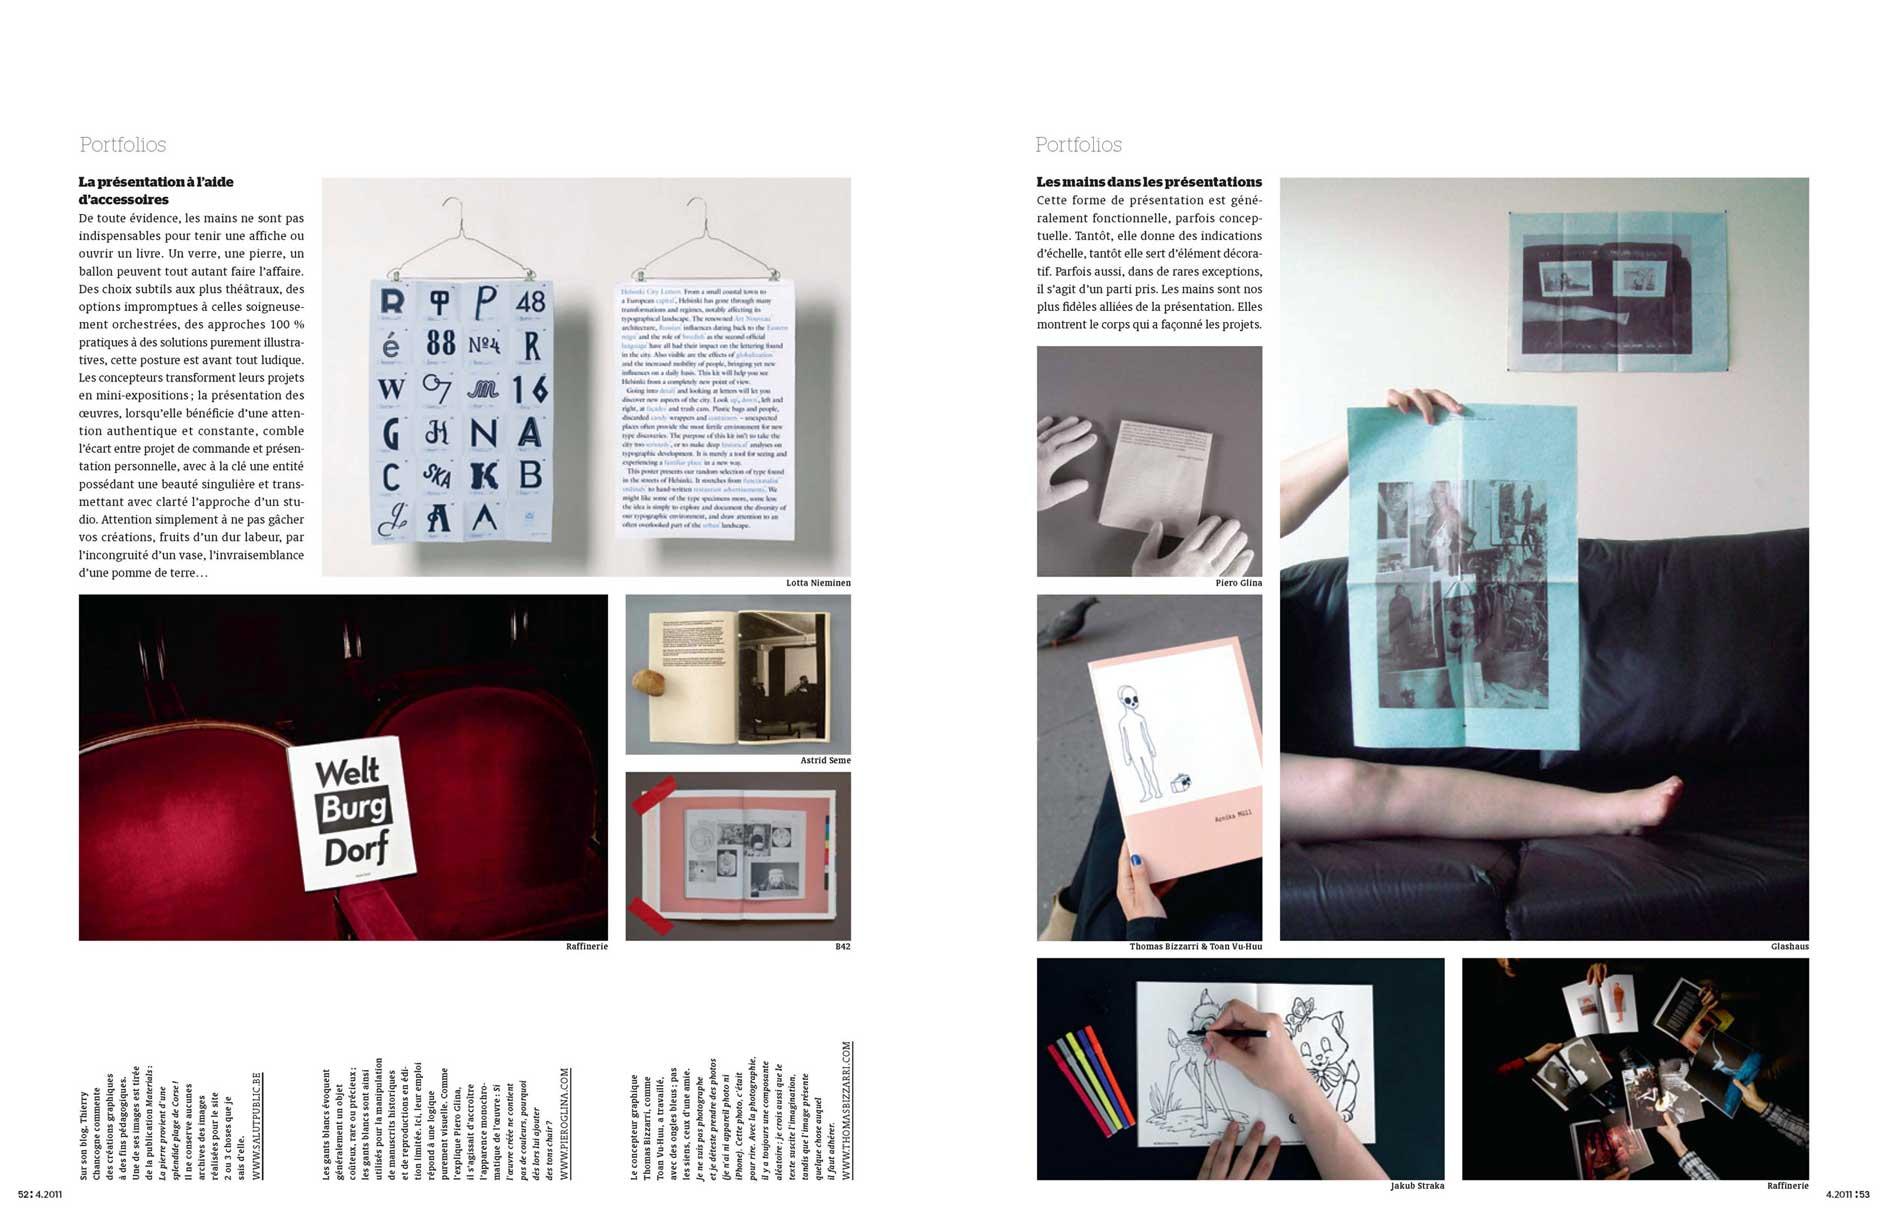 e191_portfolios-Clare-McNally_Page_3_smaller